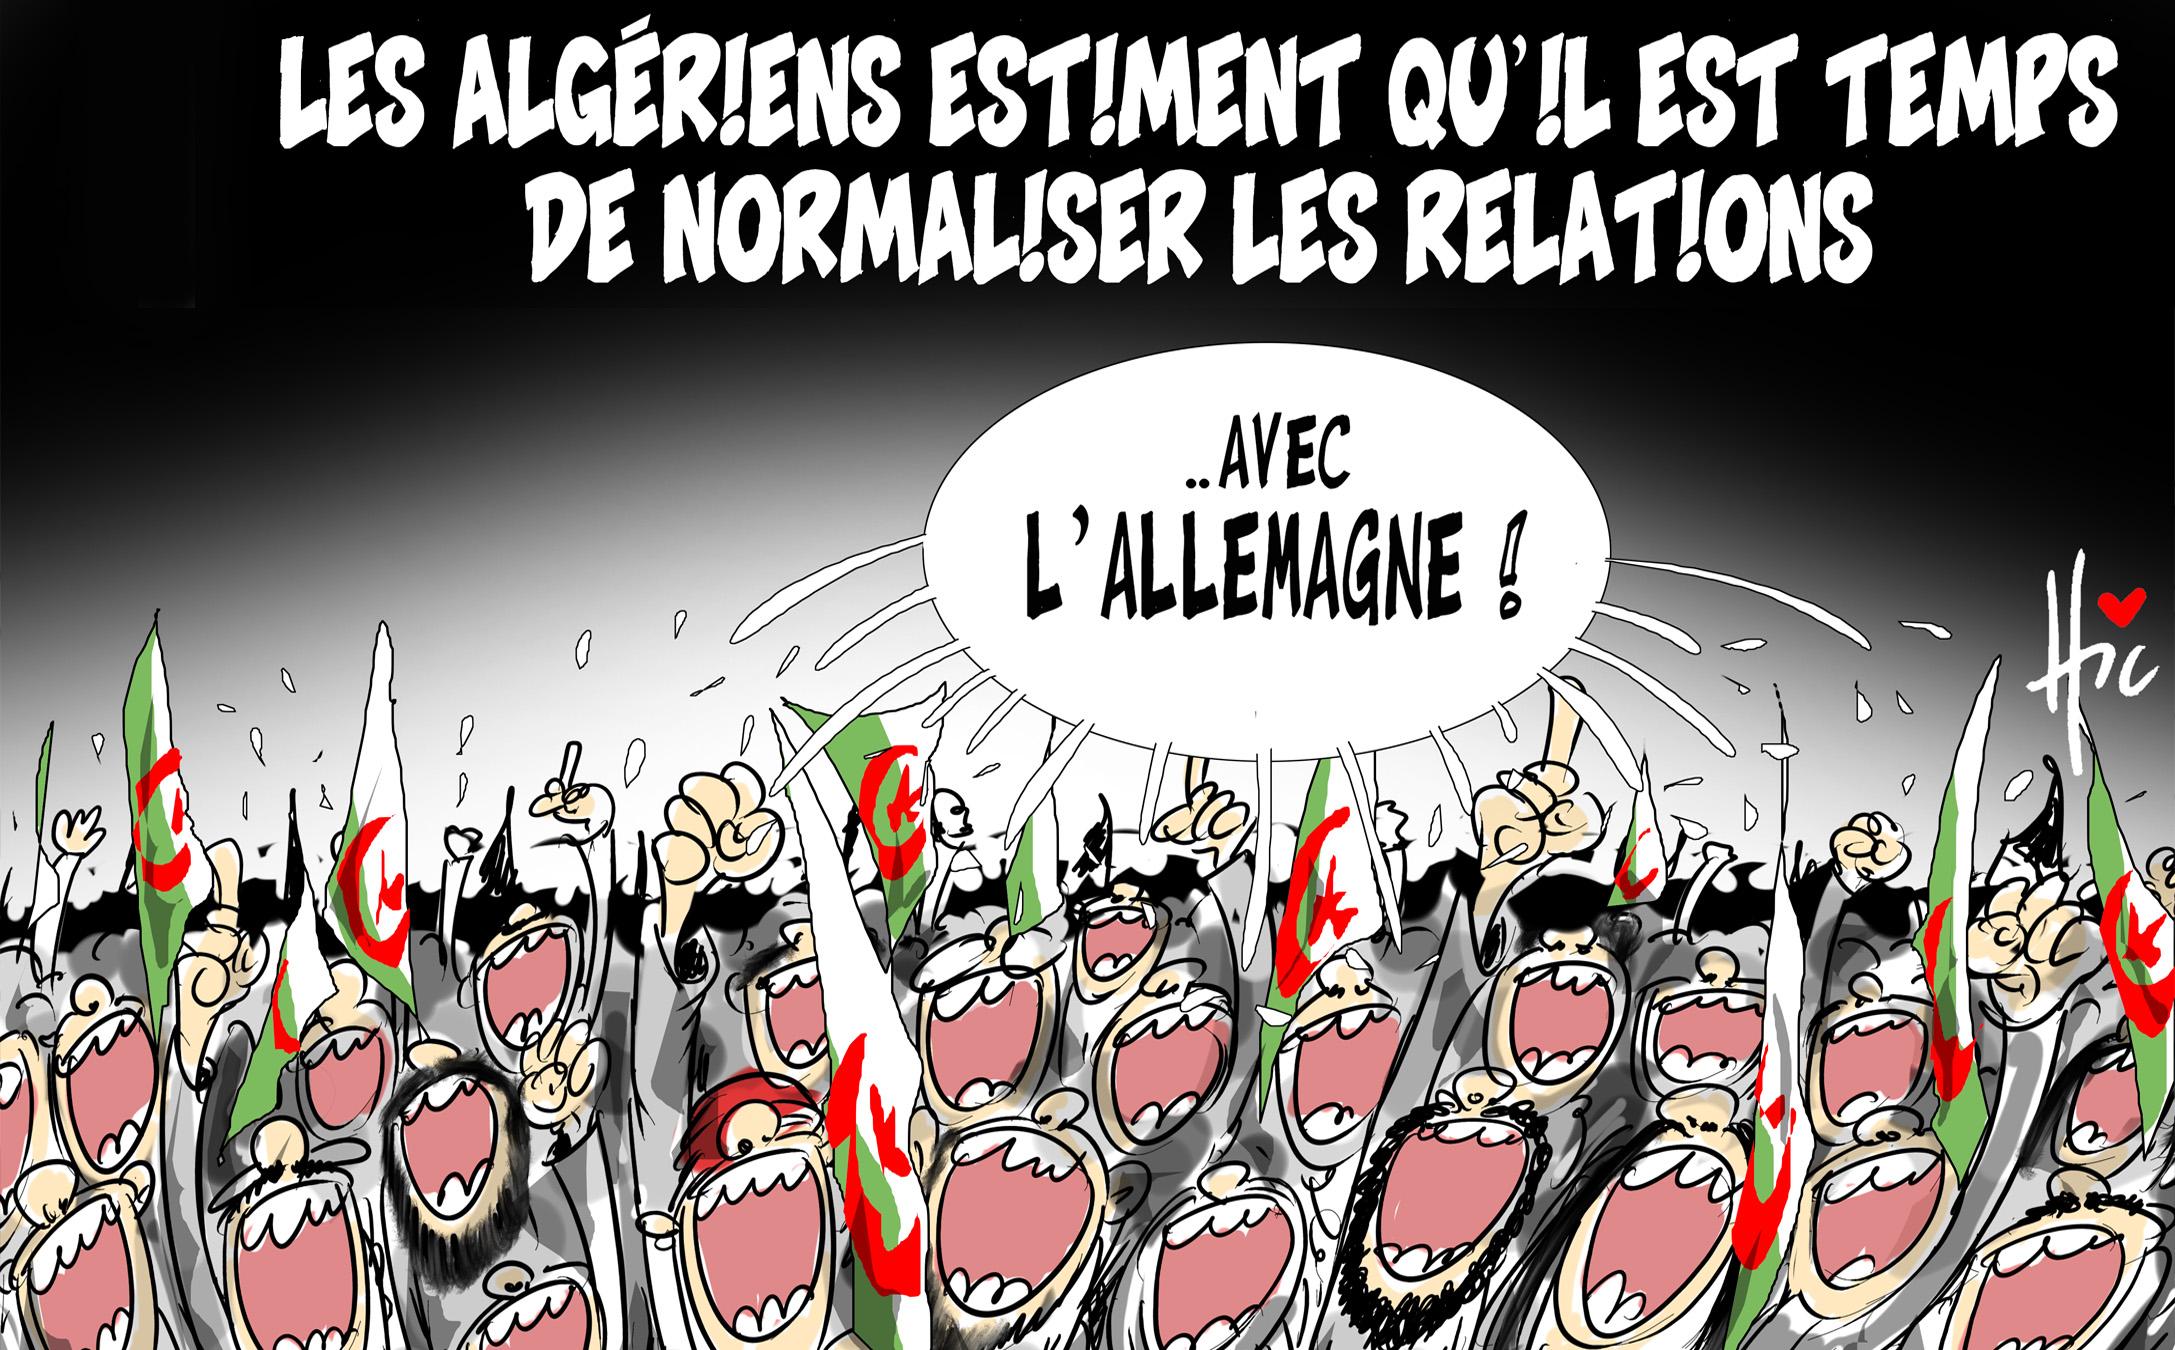 Les algériens estiment qu'il est temps de normaliser les relations avec l'Allemagne - Le Hic - El Watan - Gagdz.com